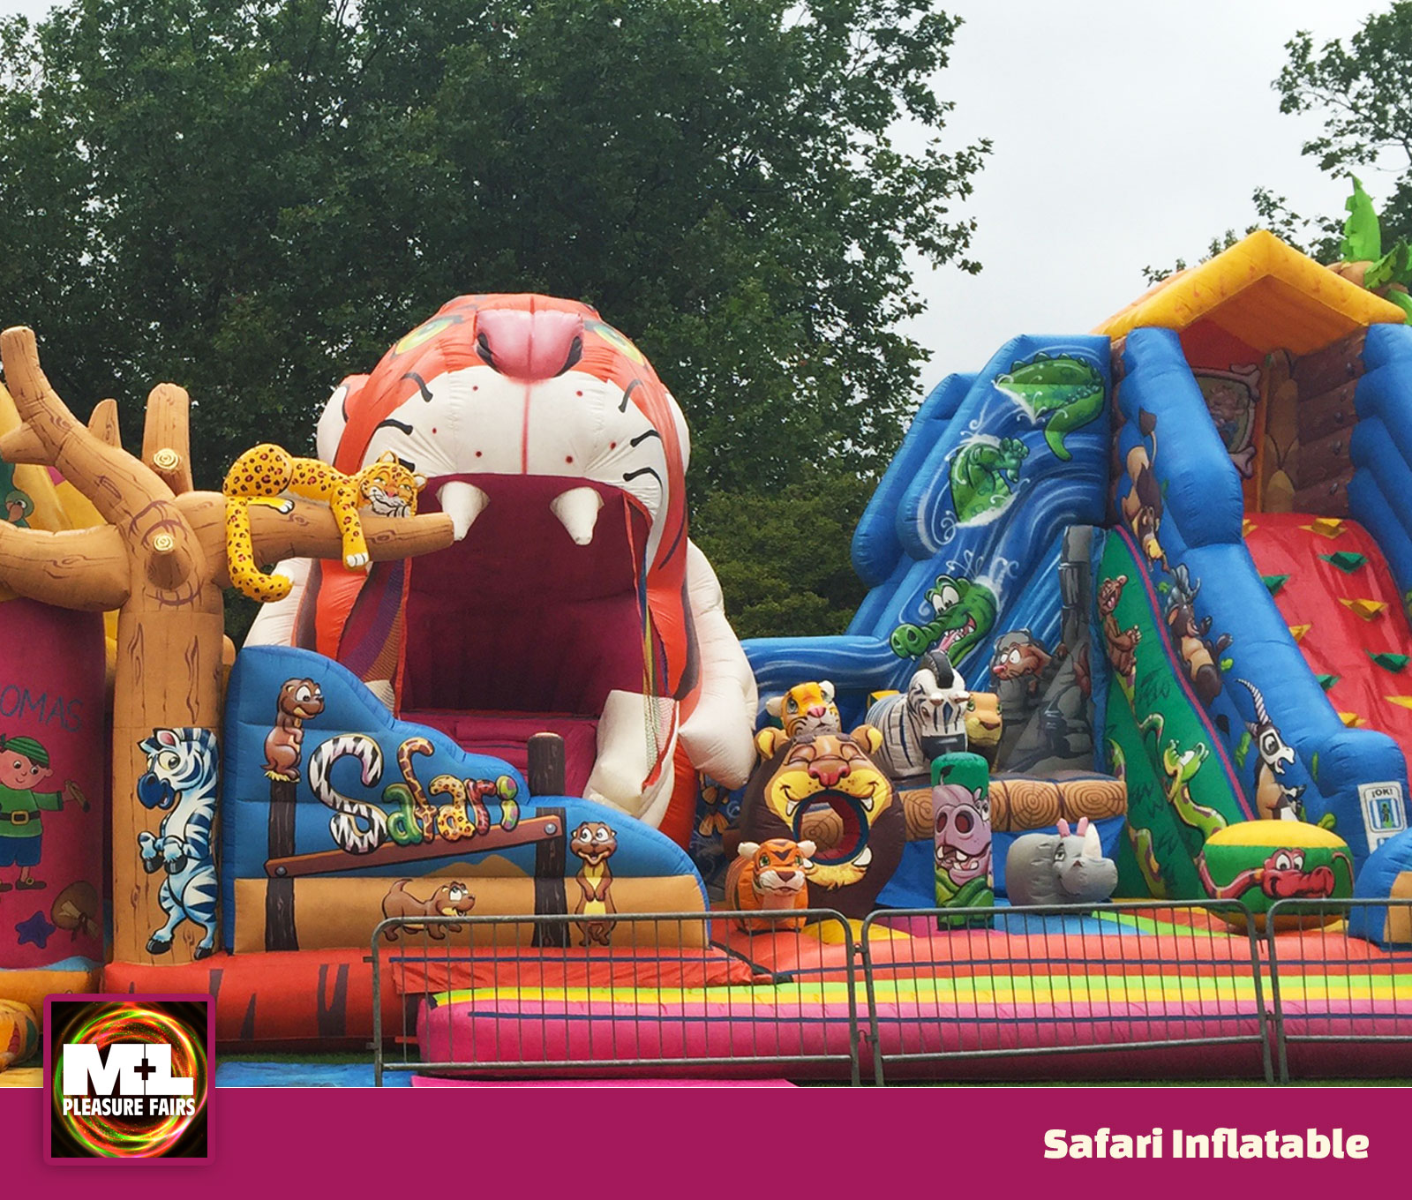 Safari Inflatable